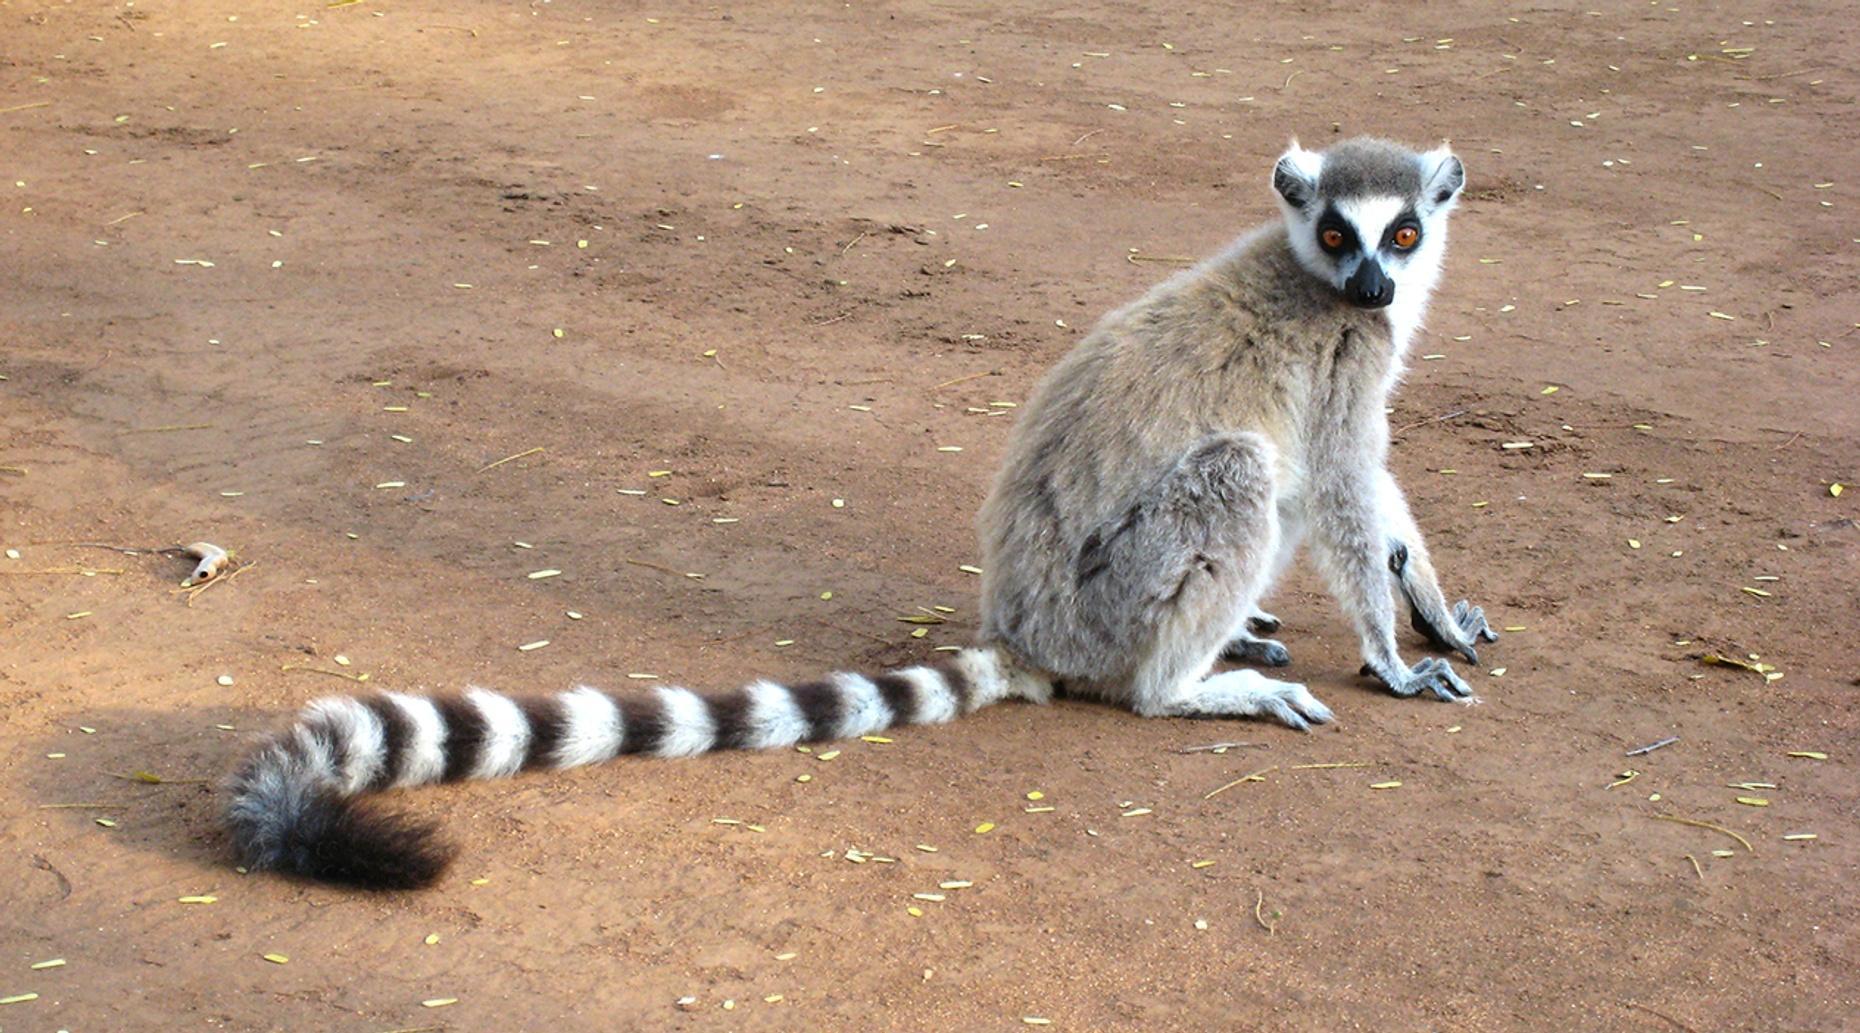 Kenansville Lemur Encounter